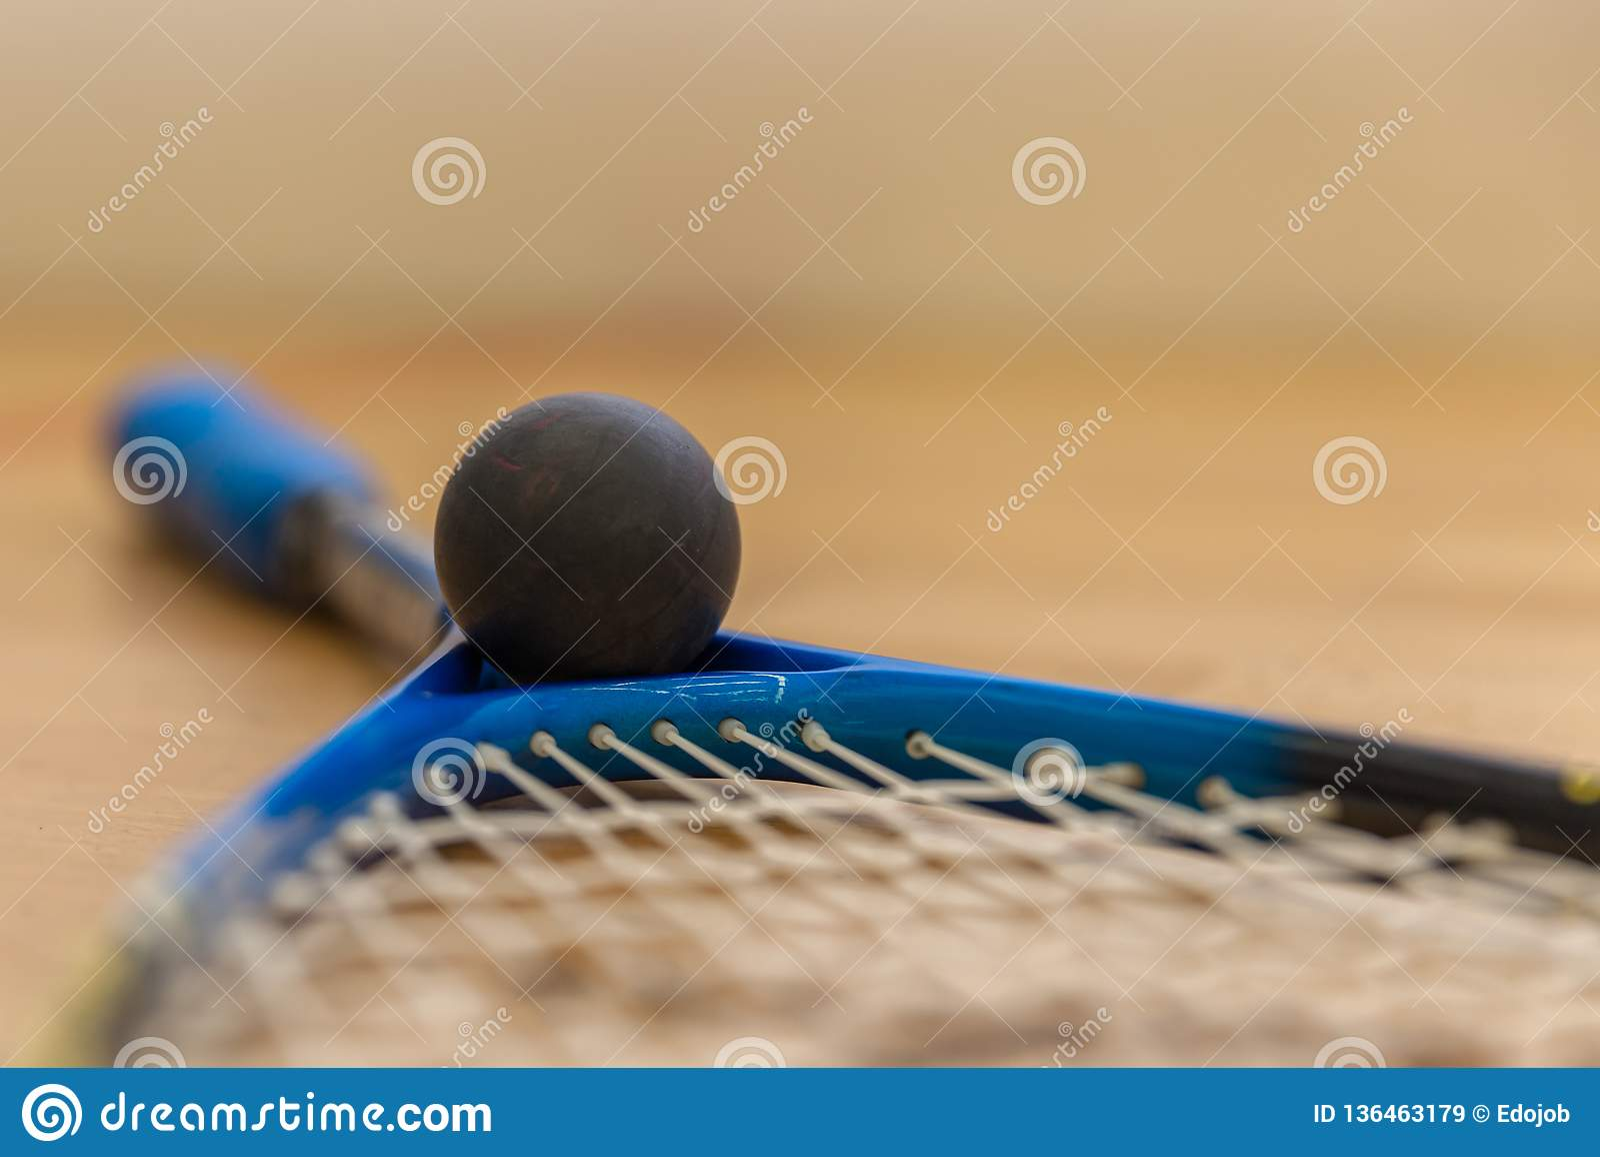 ракетки и шарики сквоша на суде